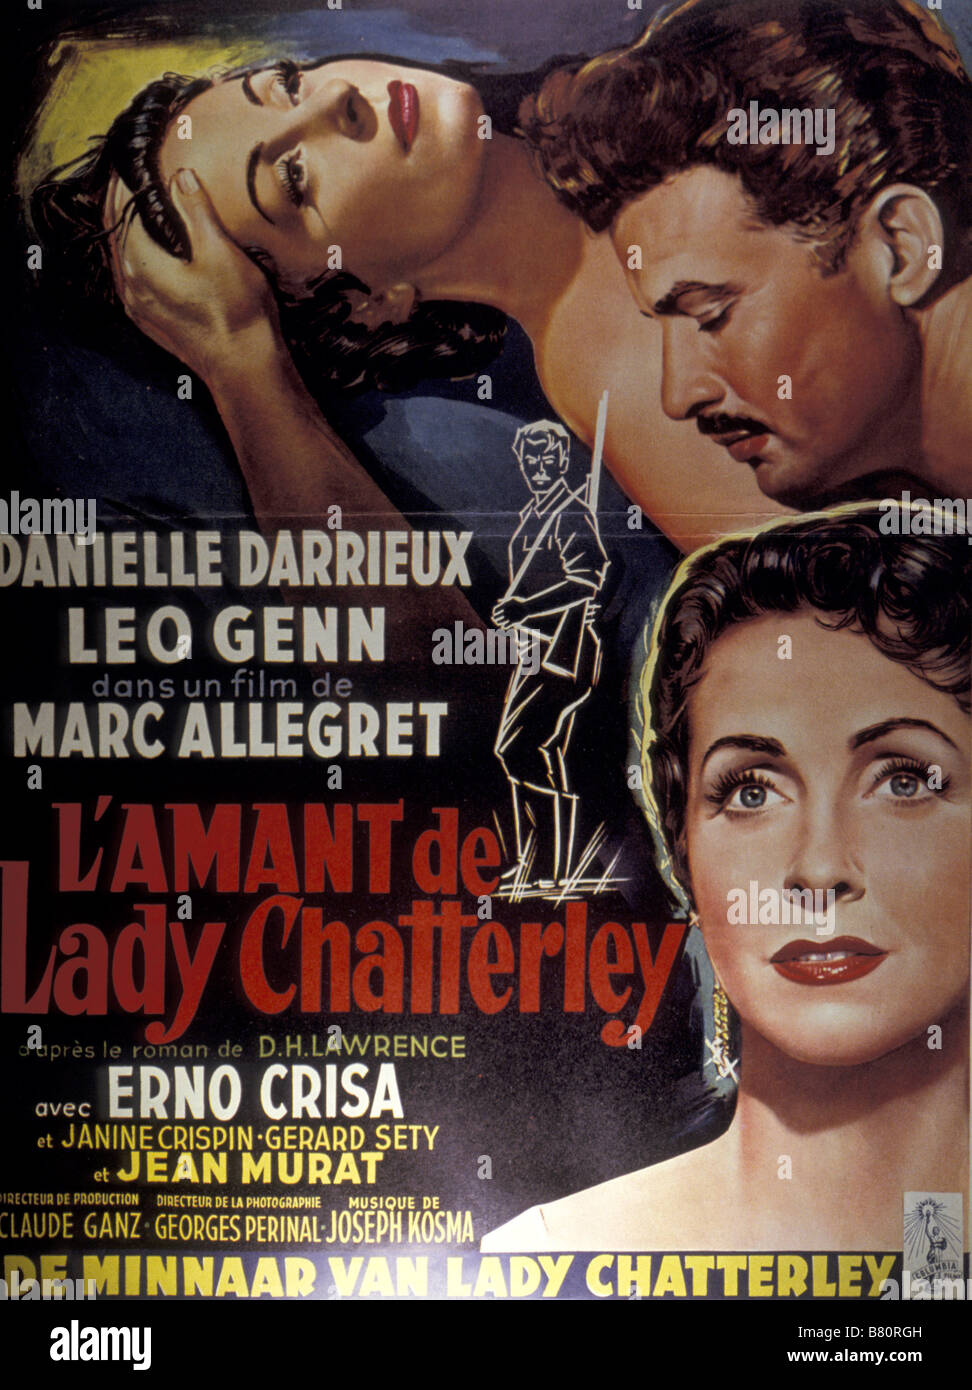 lamant de lady chatterley 1993 movie